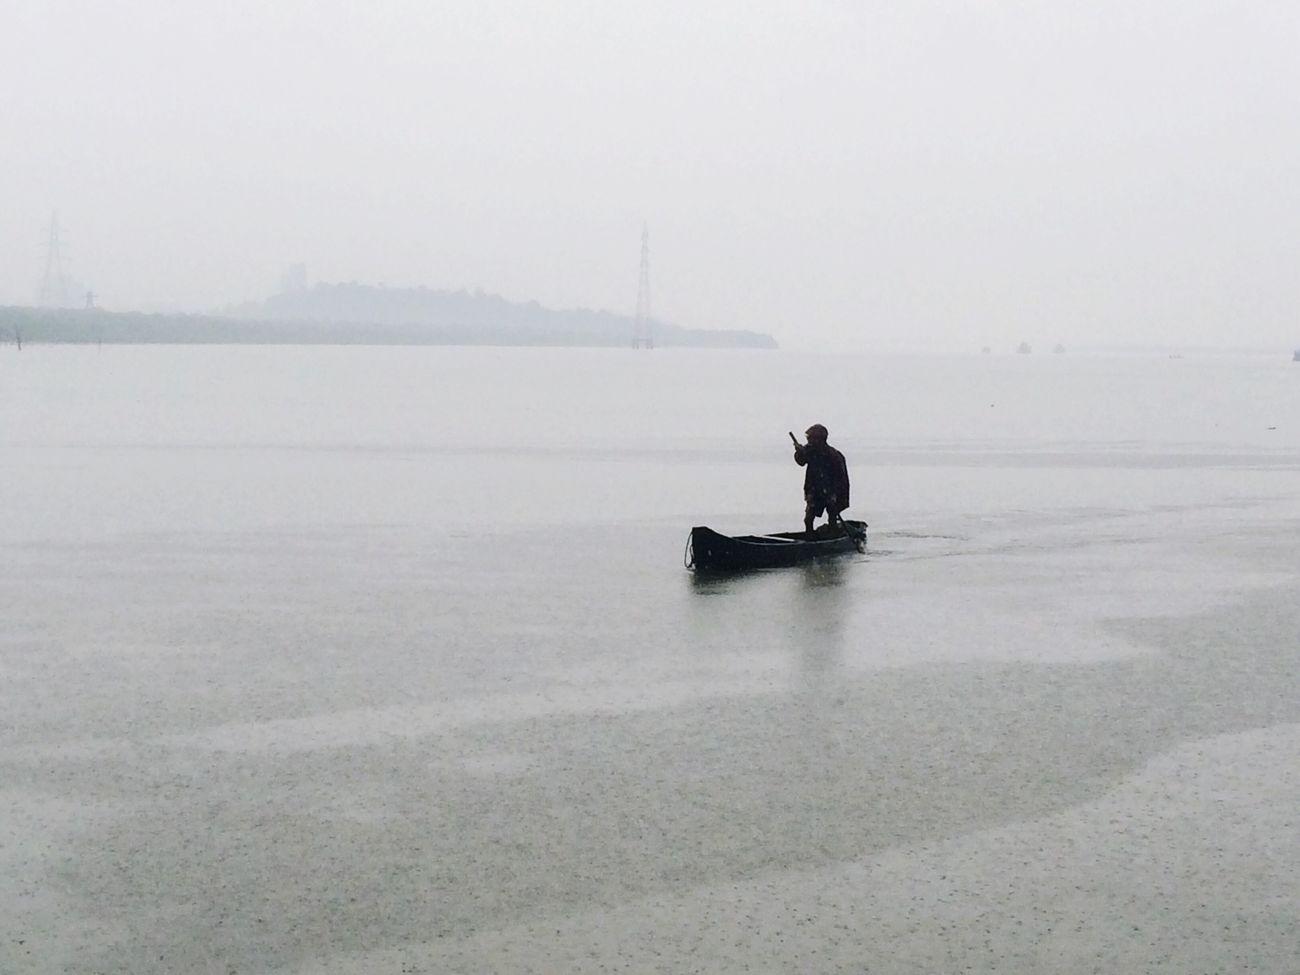 Rainy Days Rain Fishing Fisherman Boat Mobilephotography Mumbai Gorai Maharashtra